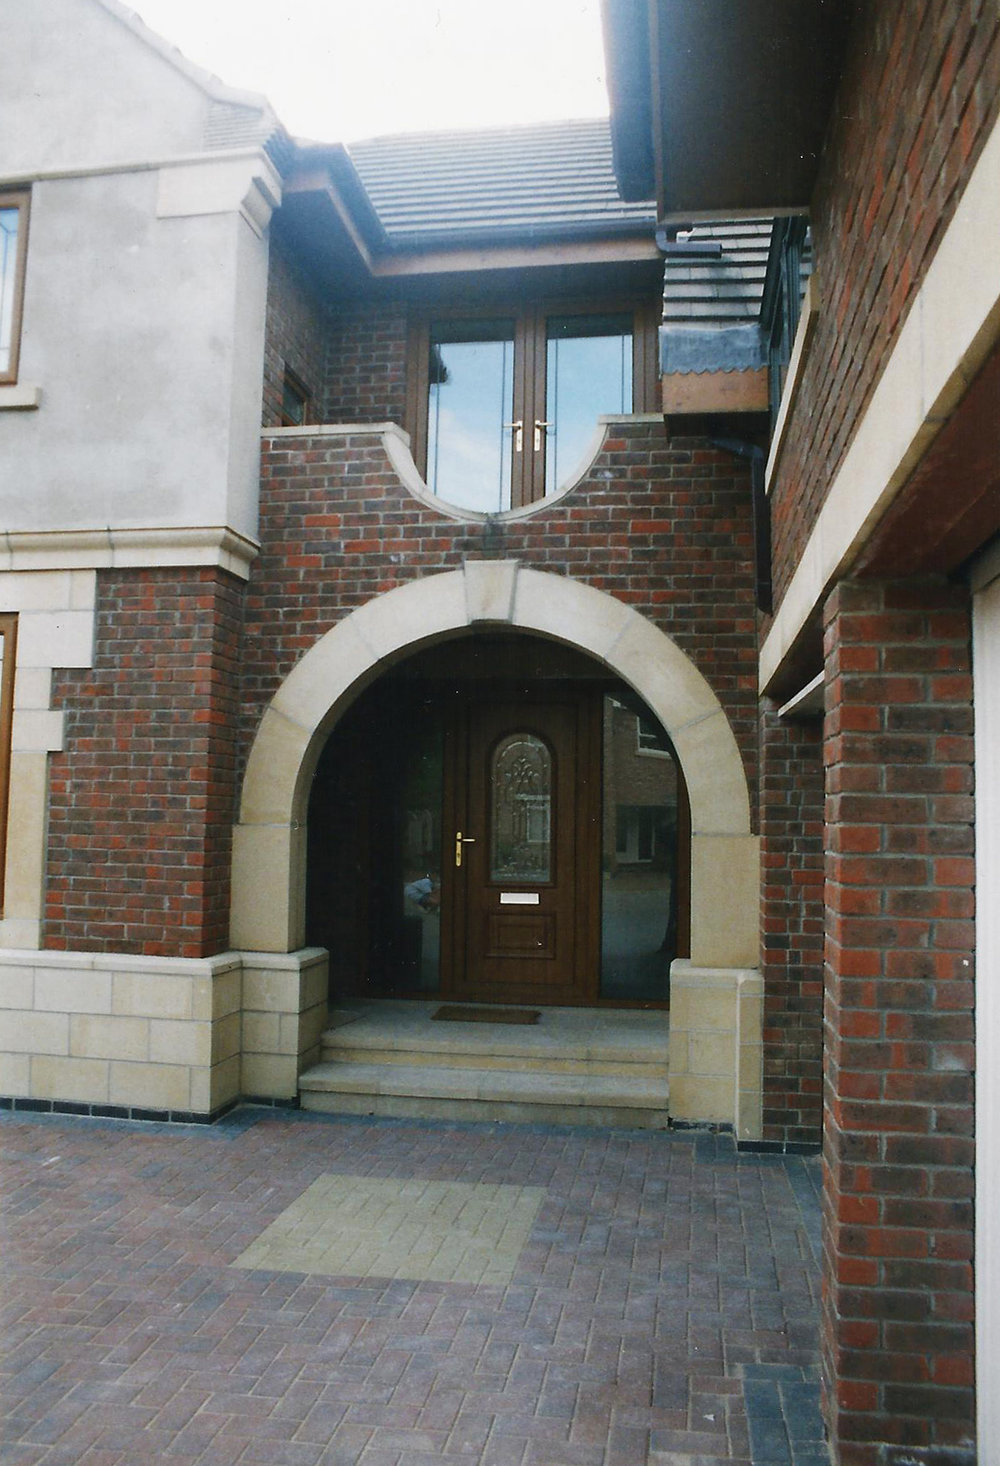 Exterior 4 - Alma Close - Hull Architects - Samuel Kendall Associates